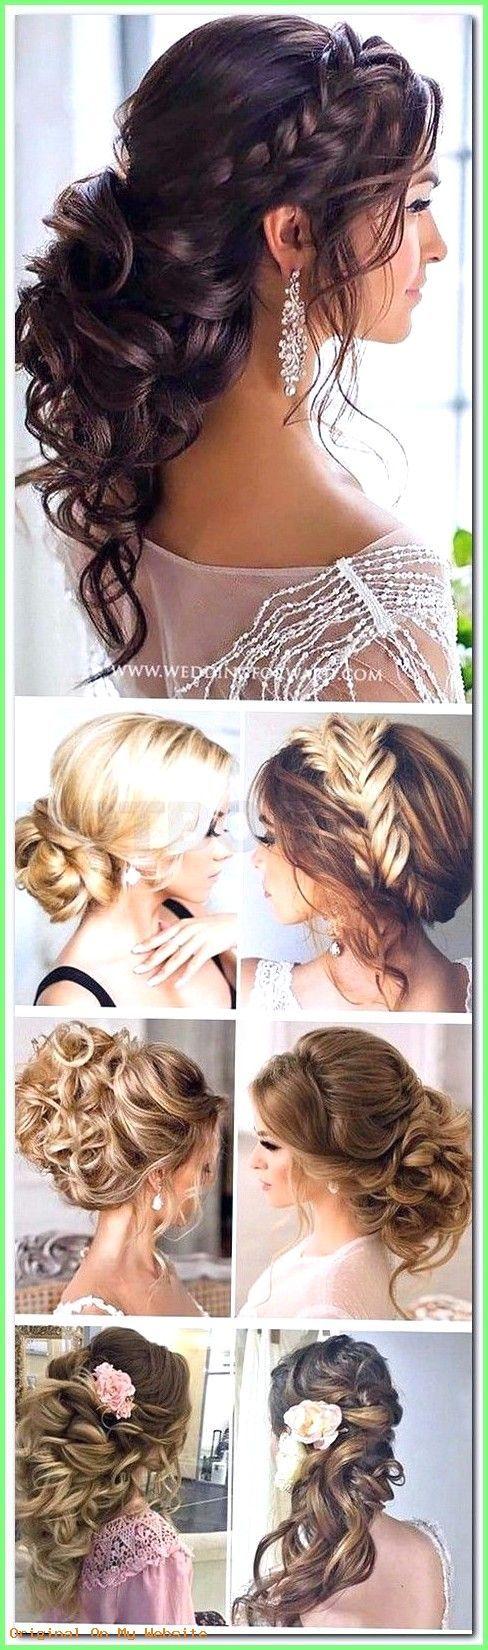 Prom Frisuren 2019  hair up styles easy short hair women style 2017 hairstyles m…